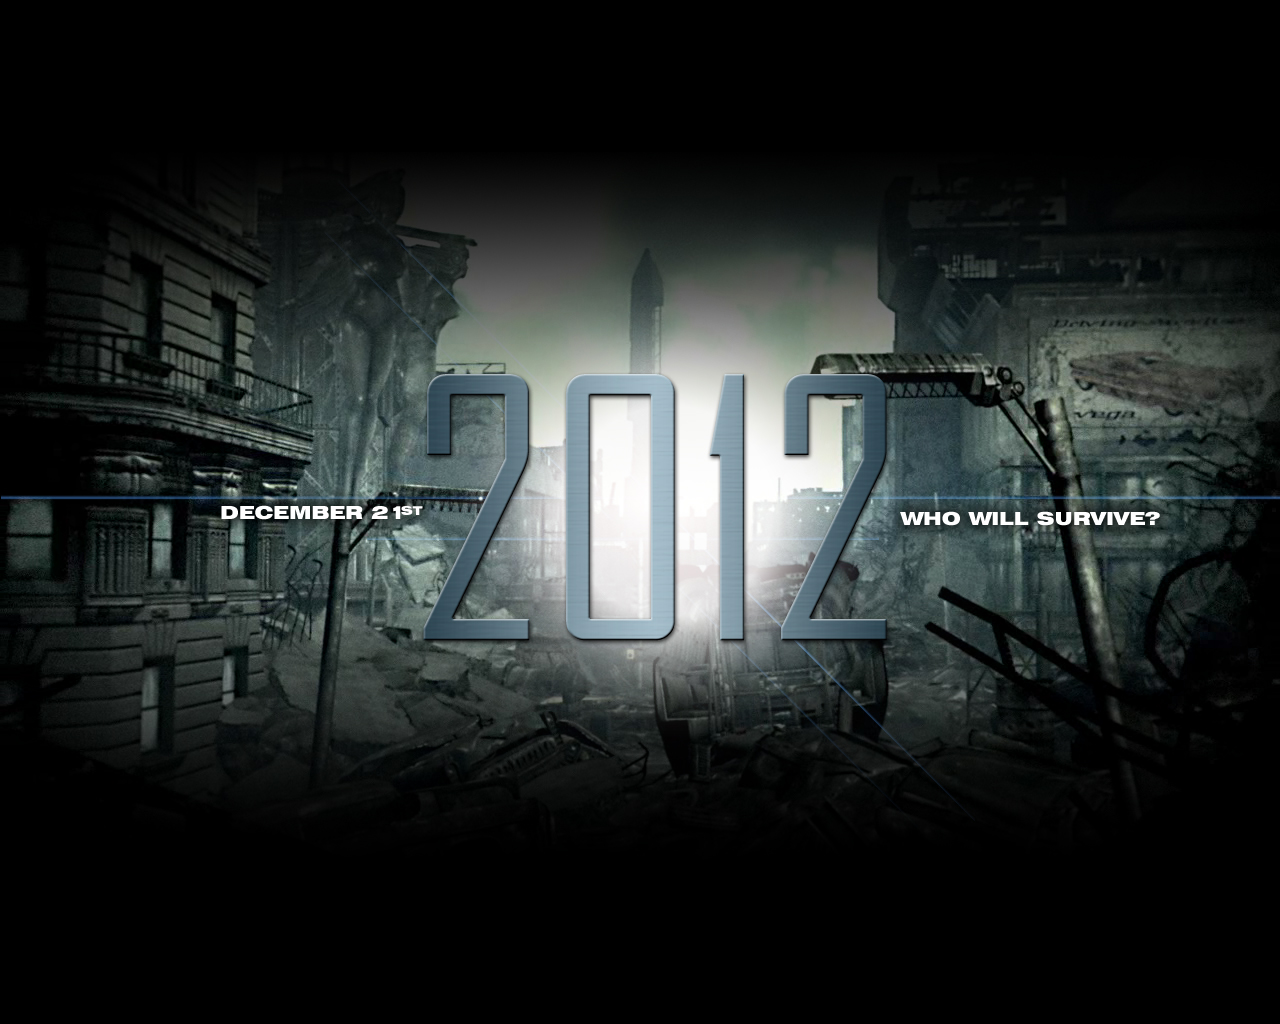 PoP DEFECT RADIO: DOOMSDAY 2012